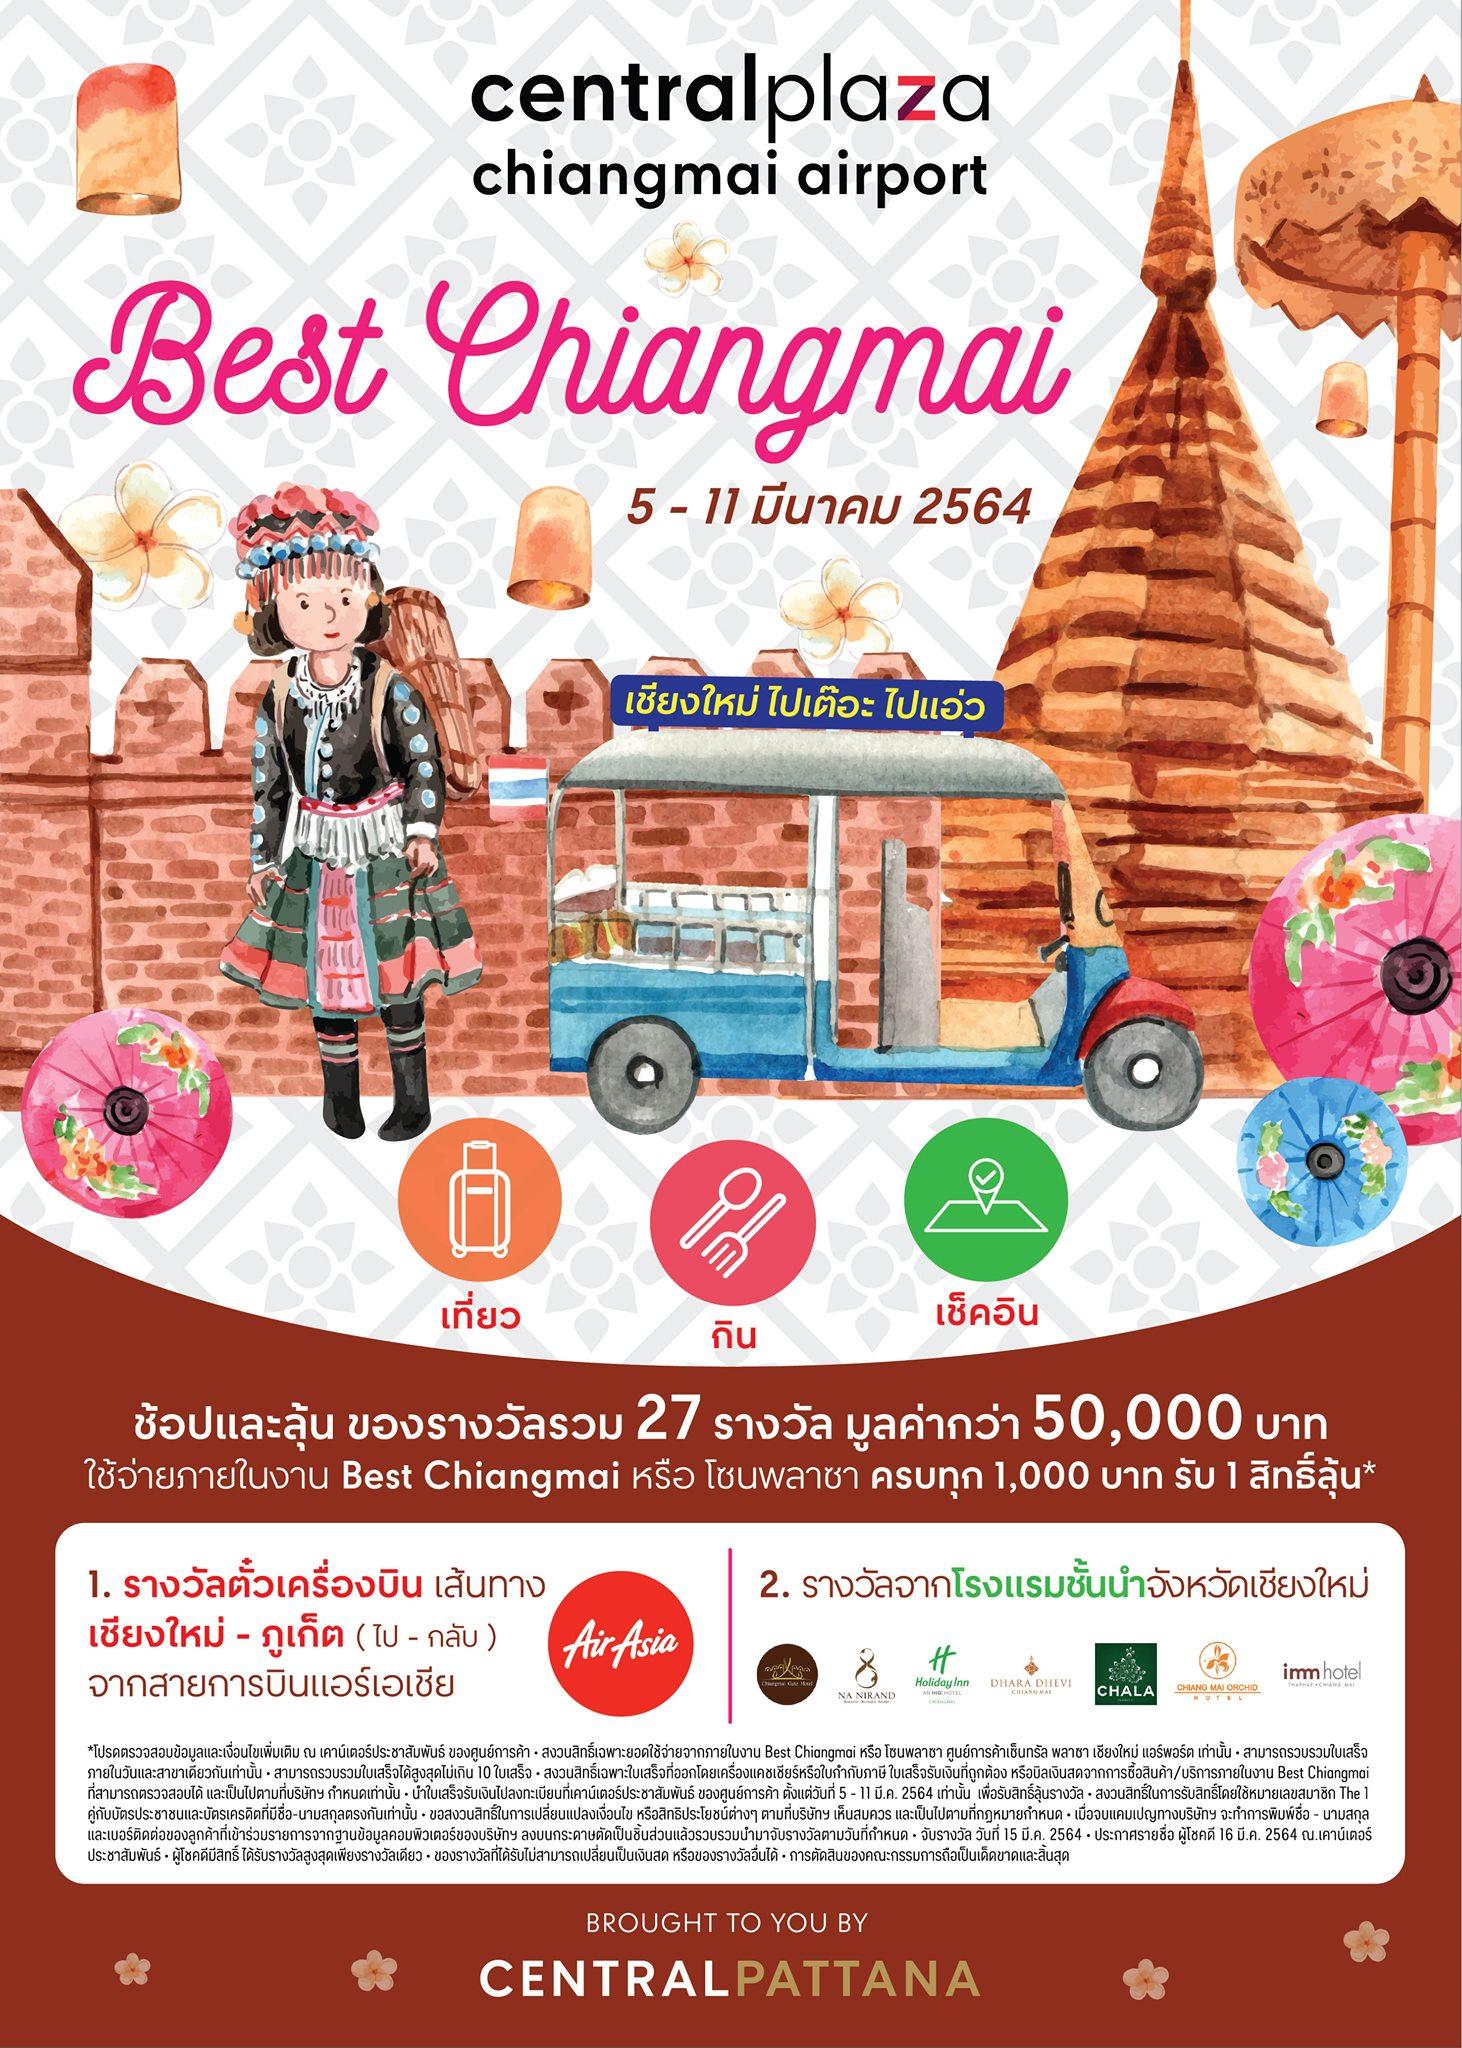 Best ChiangMai 2021 การรวมตัวกันสุดยิ่งใหญ่ จากโรงแรมดังในเชียงใหม่ 5-11 มีนาคม 2564 ลานโปรโมชั่น ชั้น G ศูนย์การค้าเซ็นทรัลพลาซา เชียงใหม่ แอร์พอร์ต